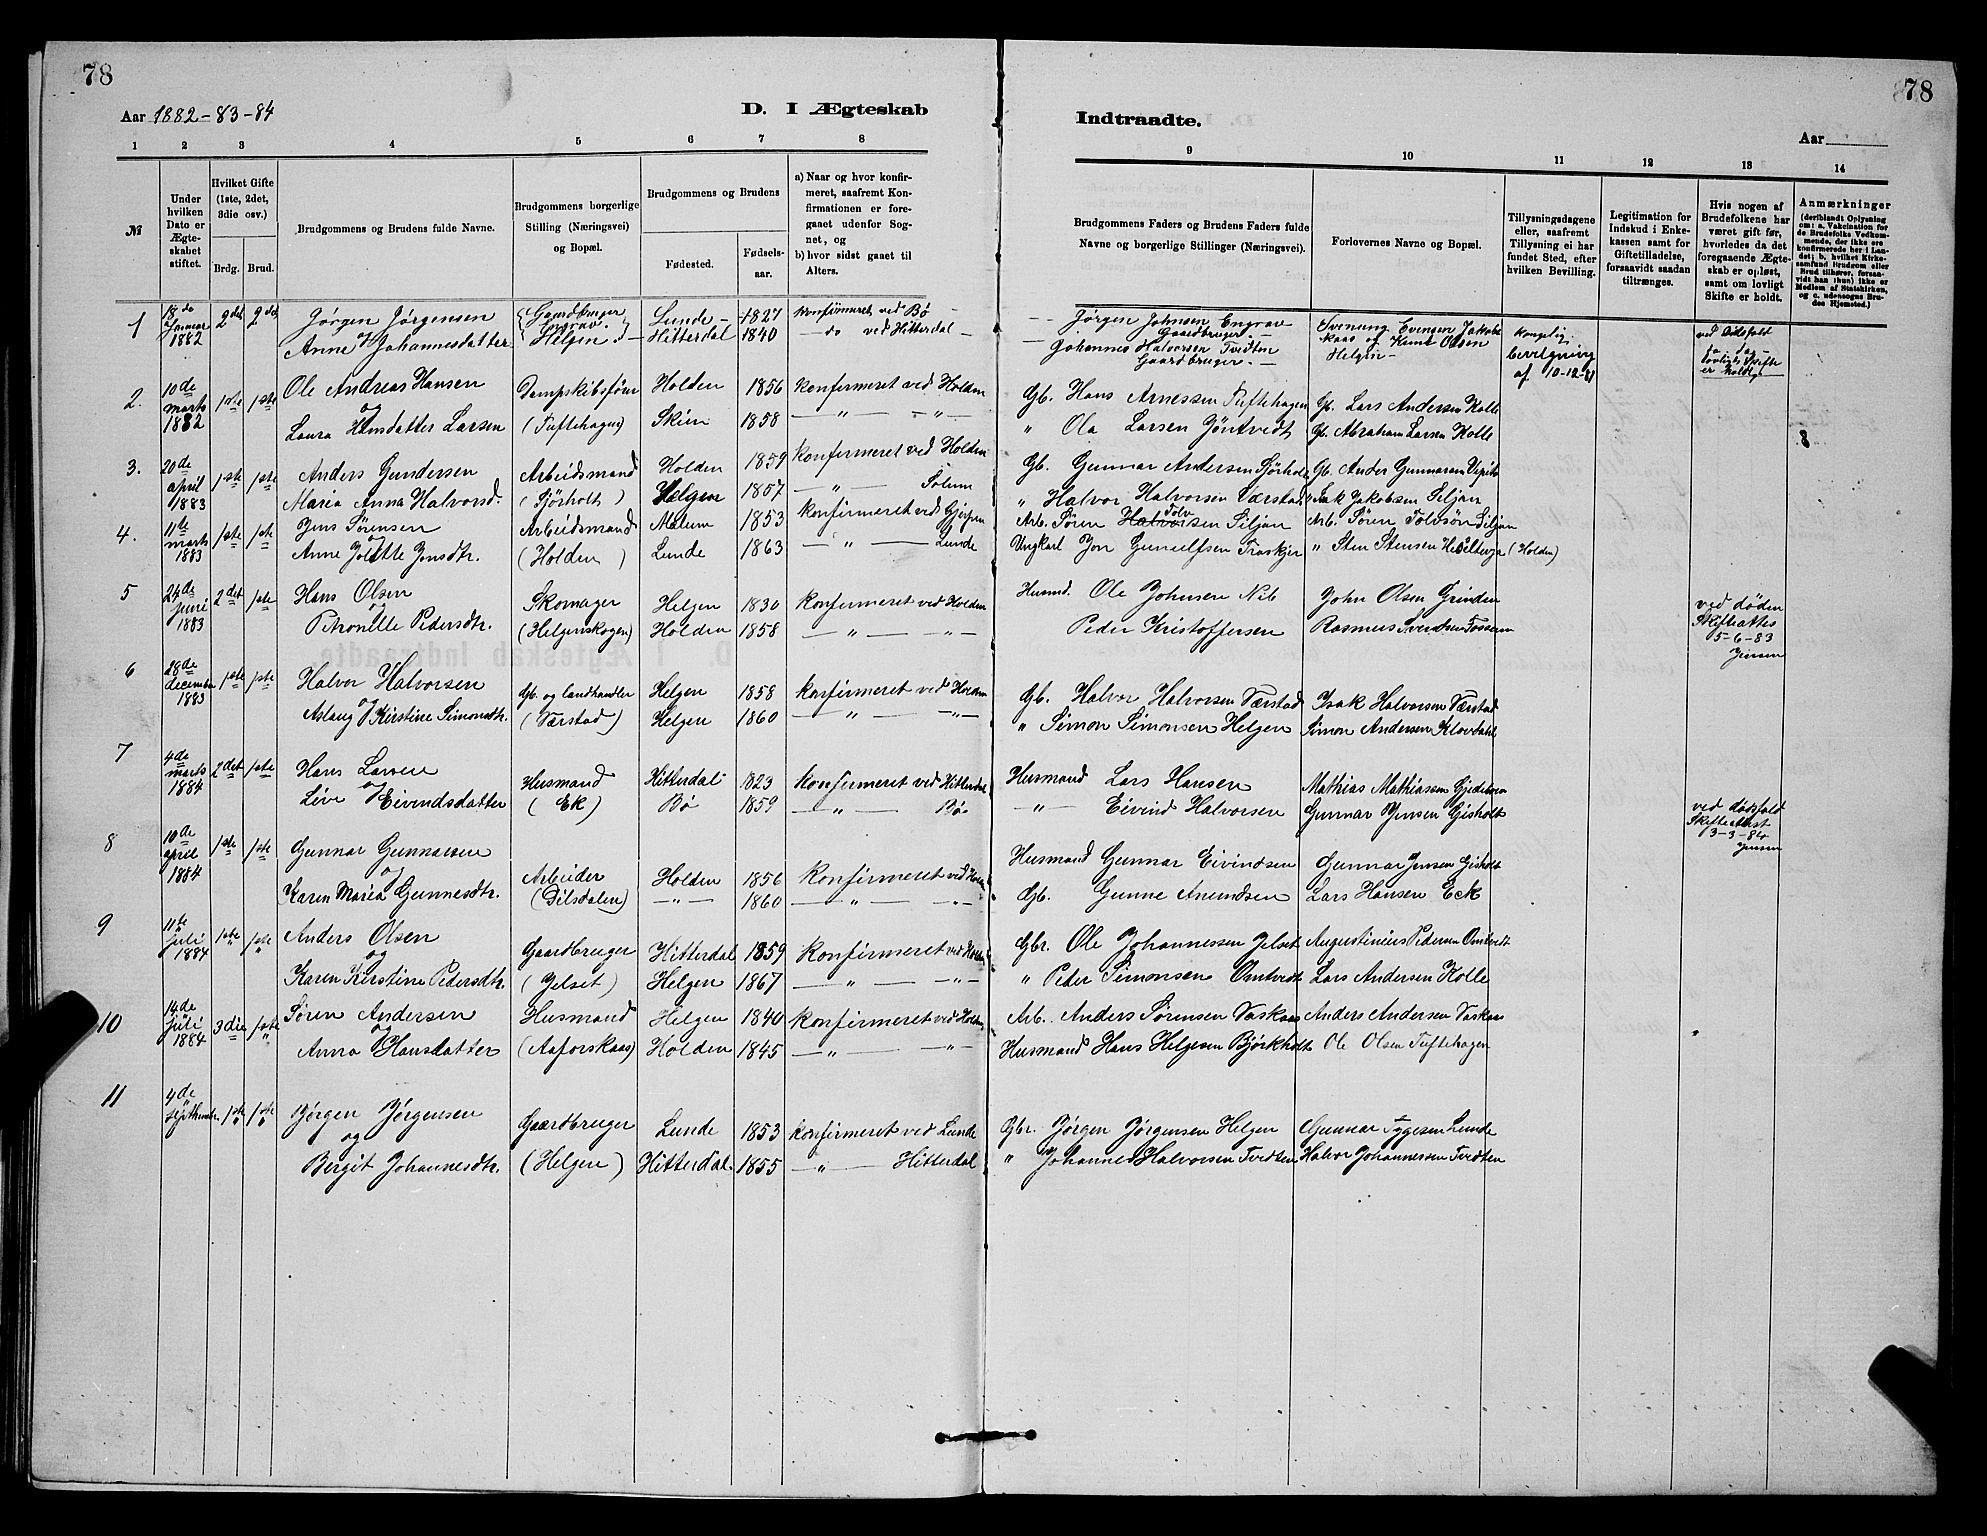 SAKO, Holla kirkebøker, G/Gb/L0001: Klokkerbok nr. II 1, 1882-1897, s. 78